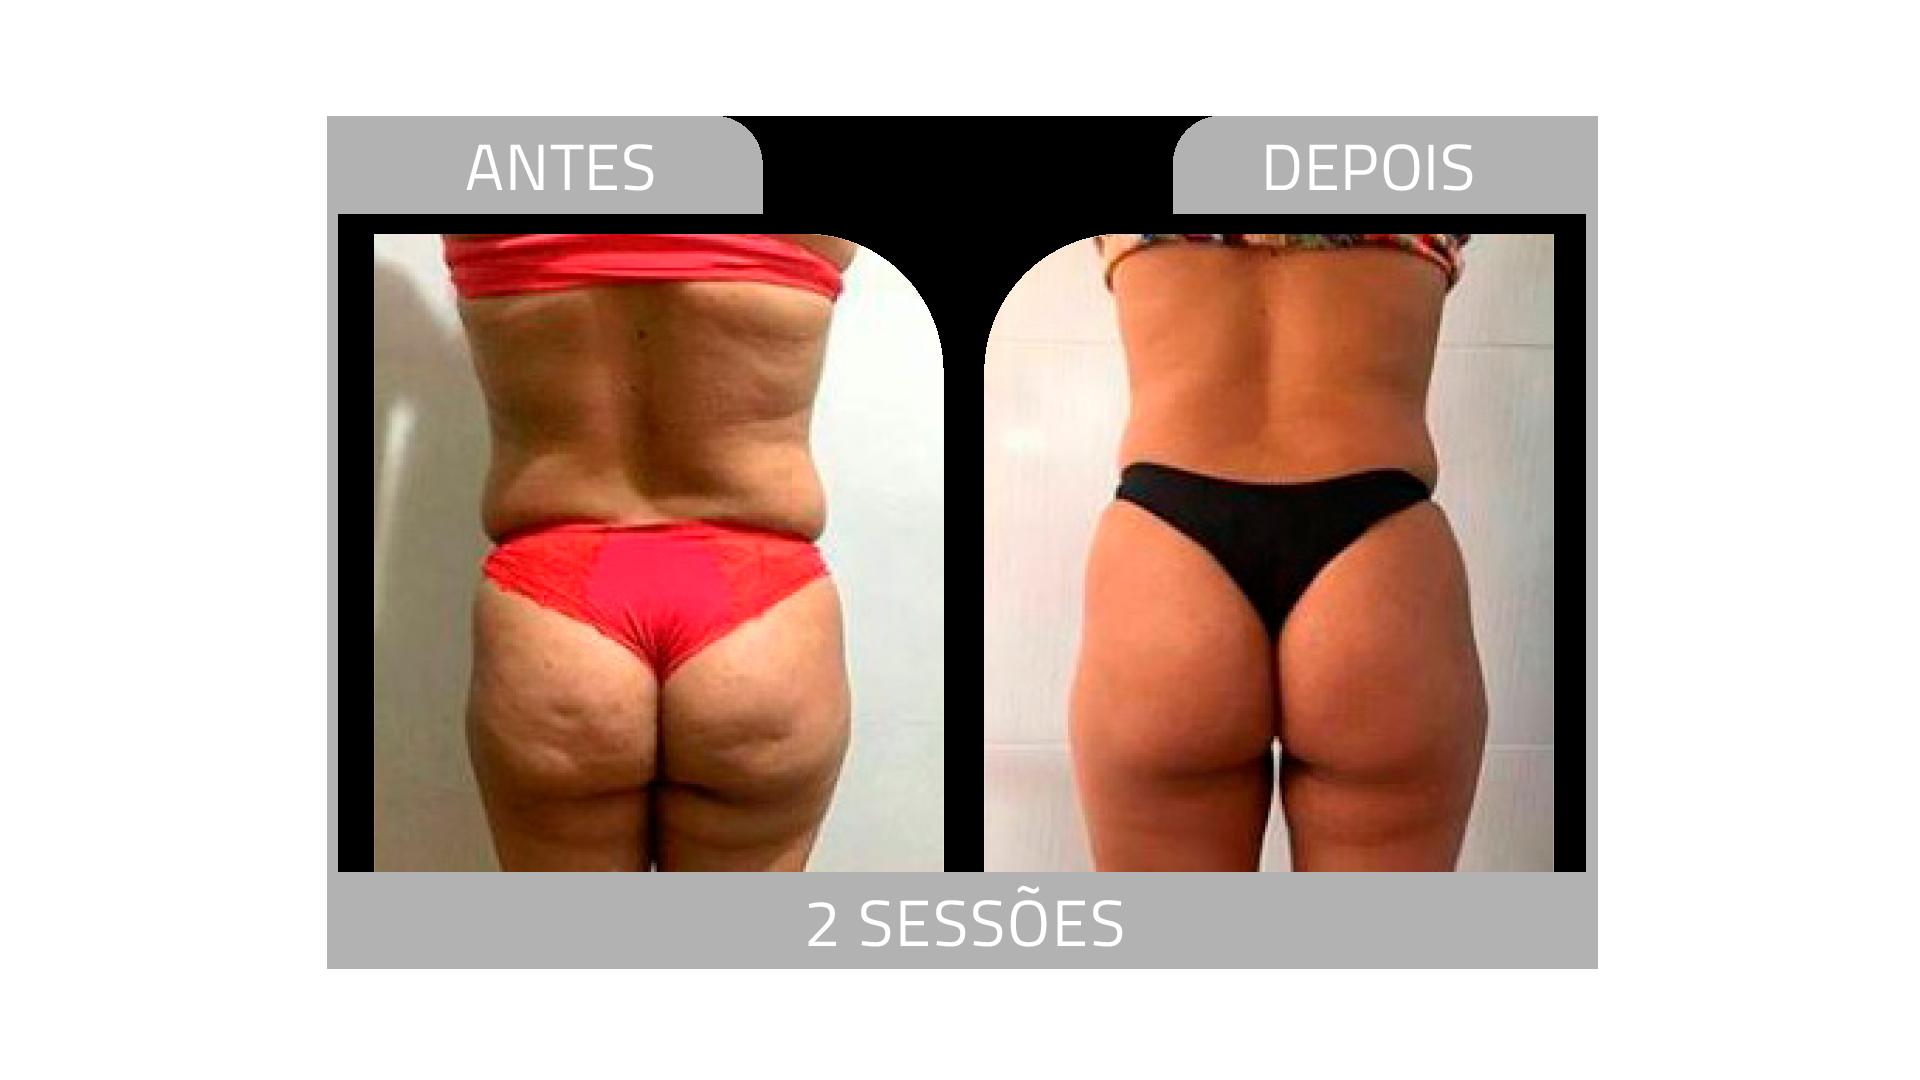 ANTES E DEPOIS LG 1.png